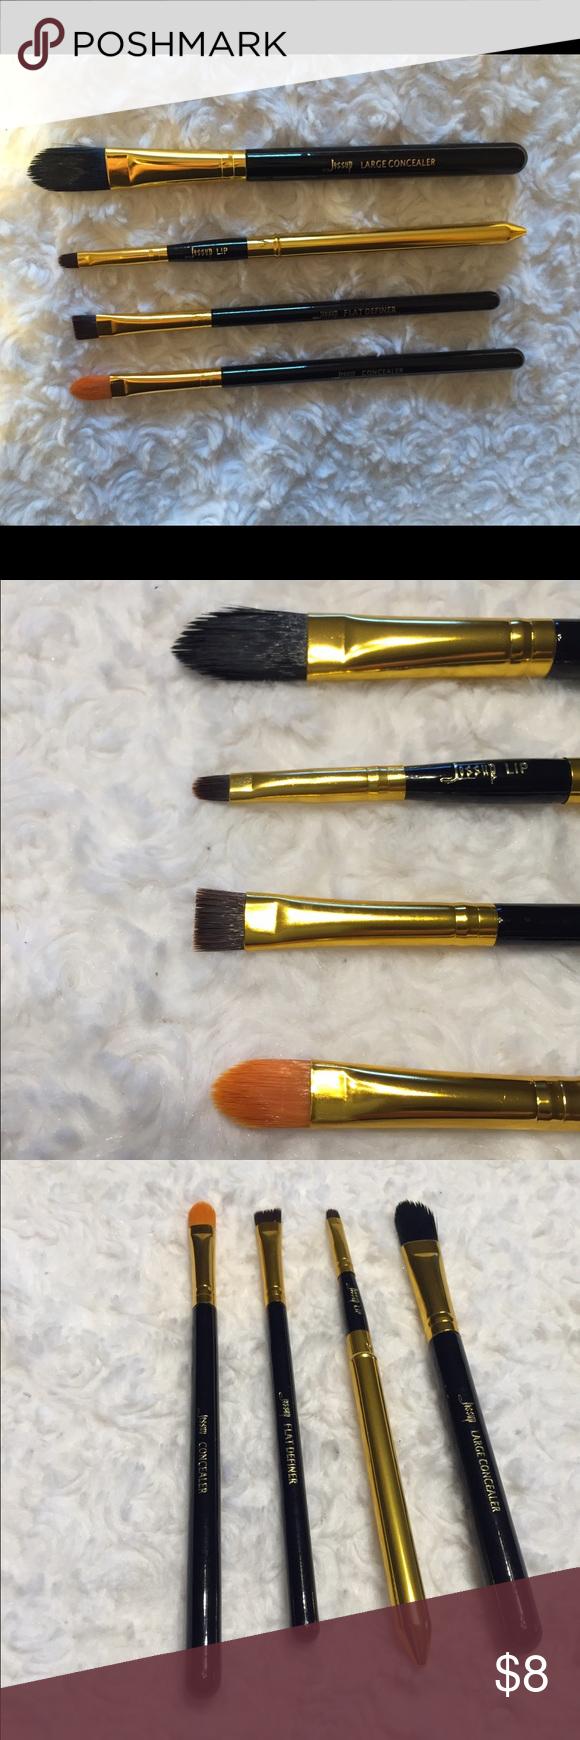 Jessup brush bundle Large concealer brush, lip brush, flat